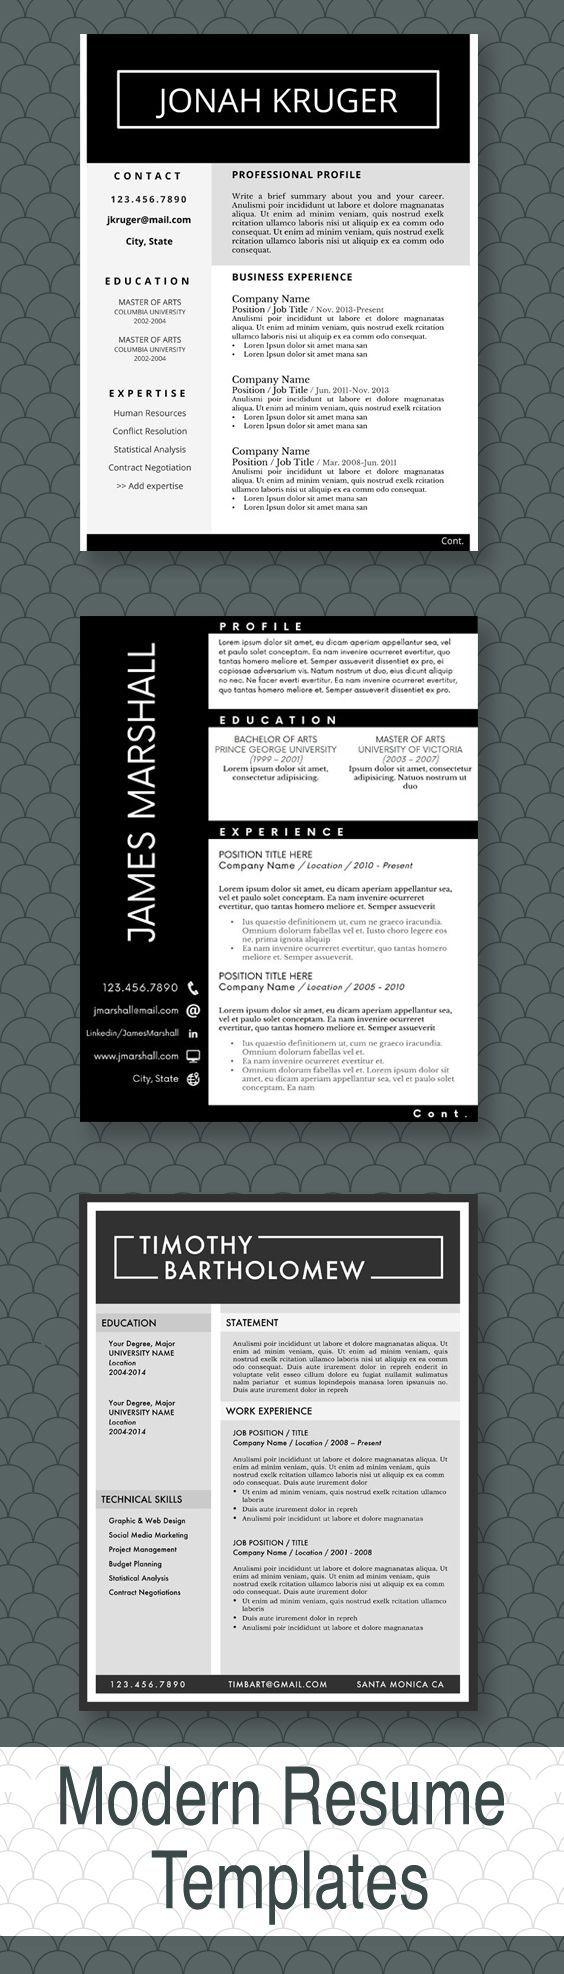 foundry resume sample